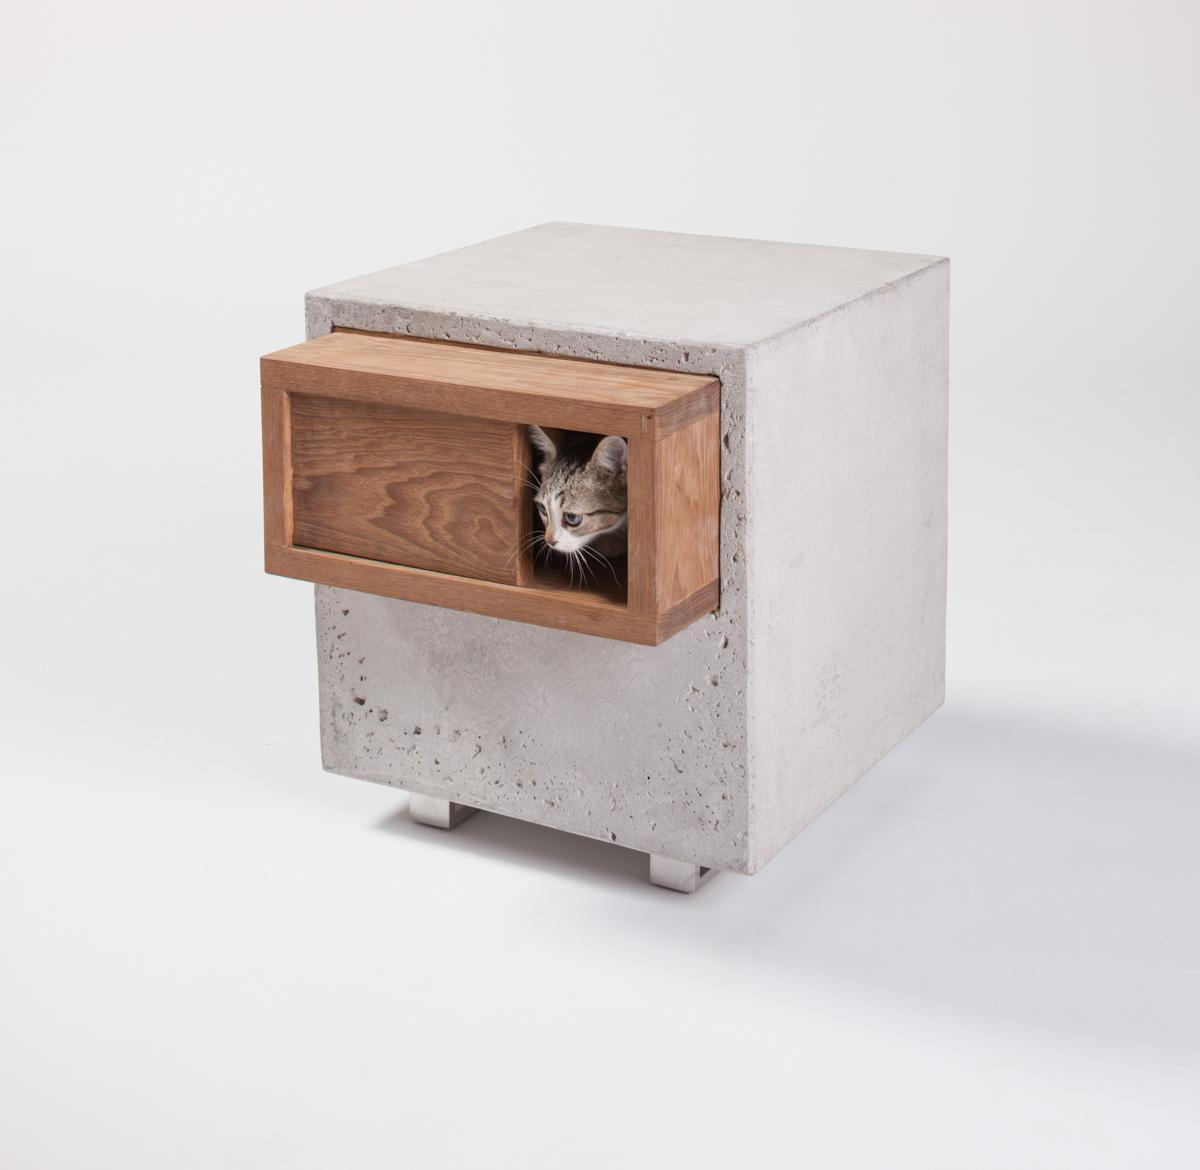 Brutalist Architecture for Cats http://t.co/hPXJSL7vl0